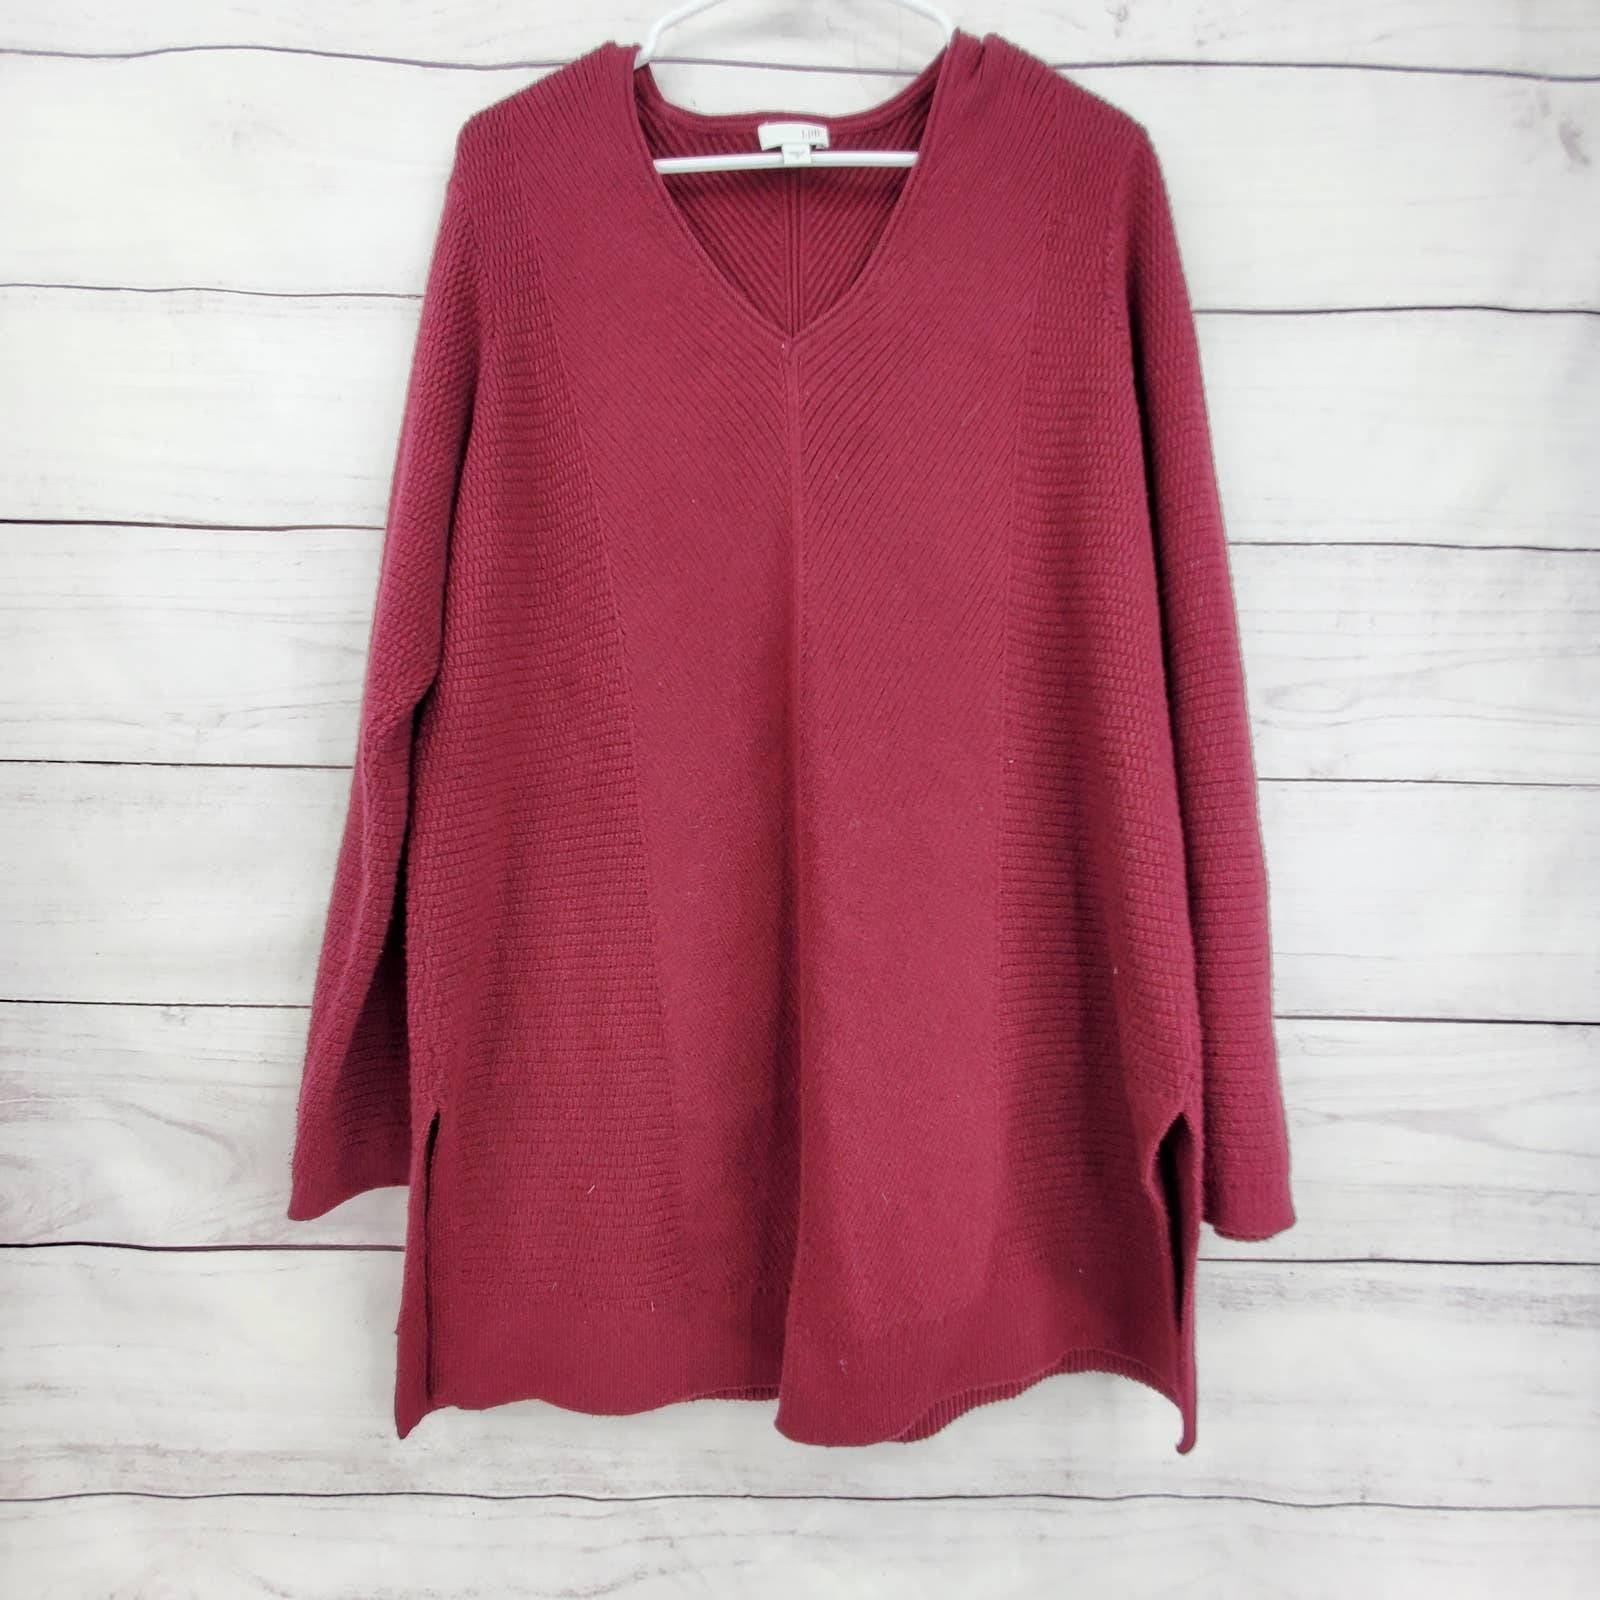 J. Jill Maroon Chunky Oversize Sweater